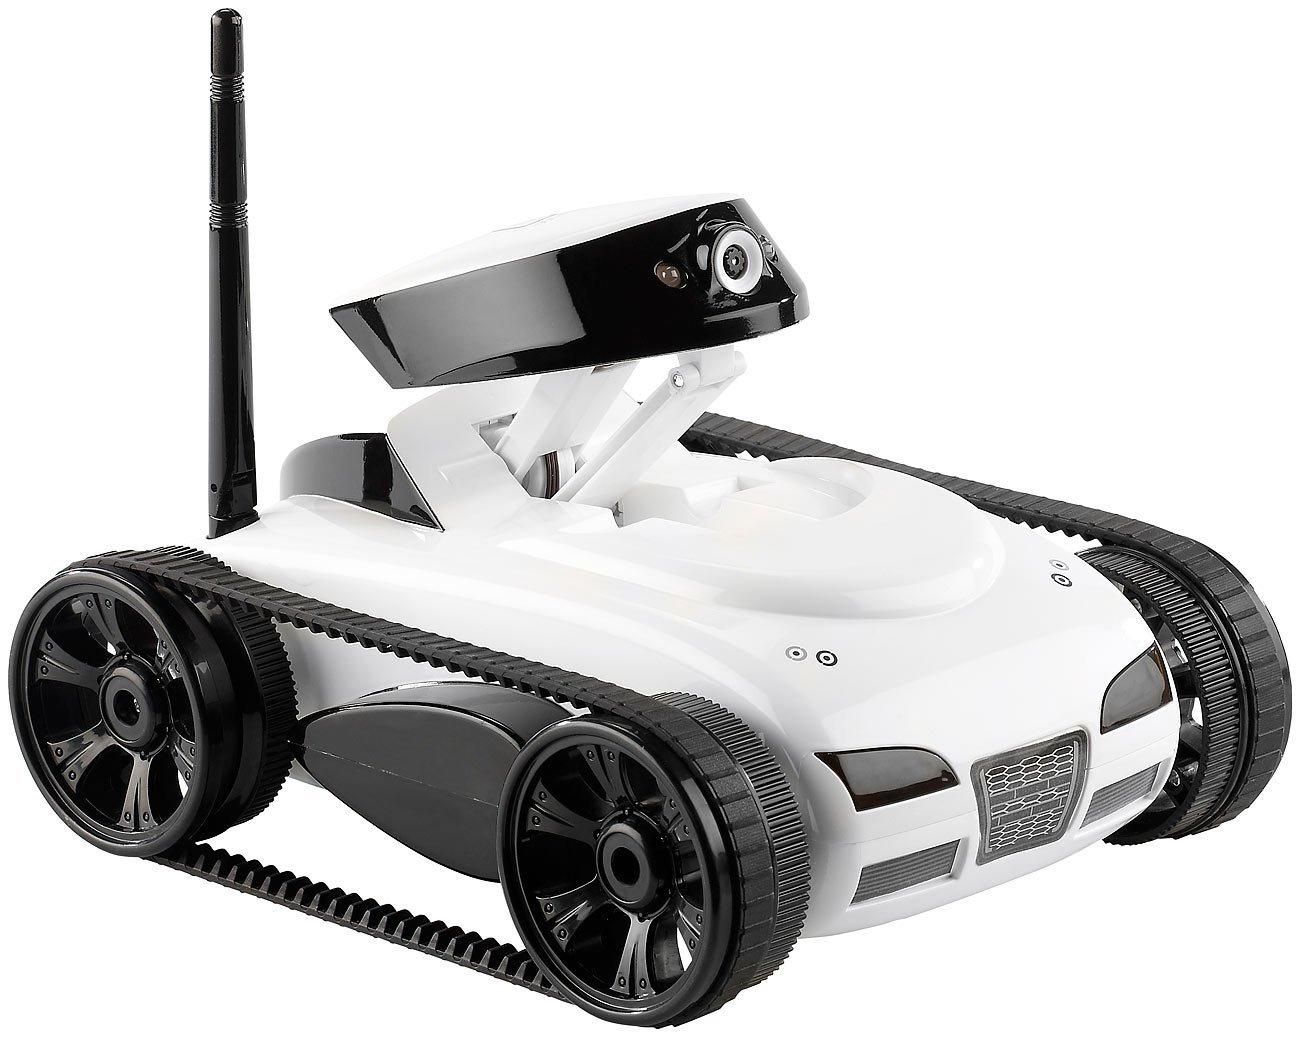 simulus wlan gesteuertes kamera auto wlc 240 wifi ipad. Black Bedroom Furniture Sets. Home Design Ideas